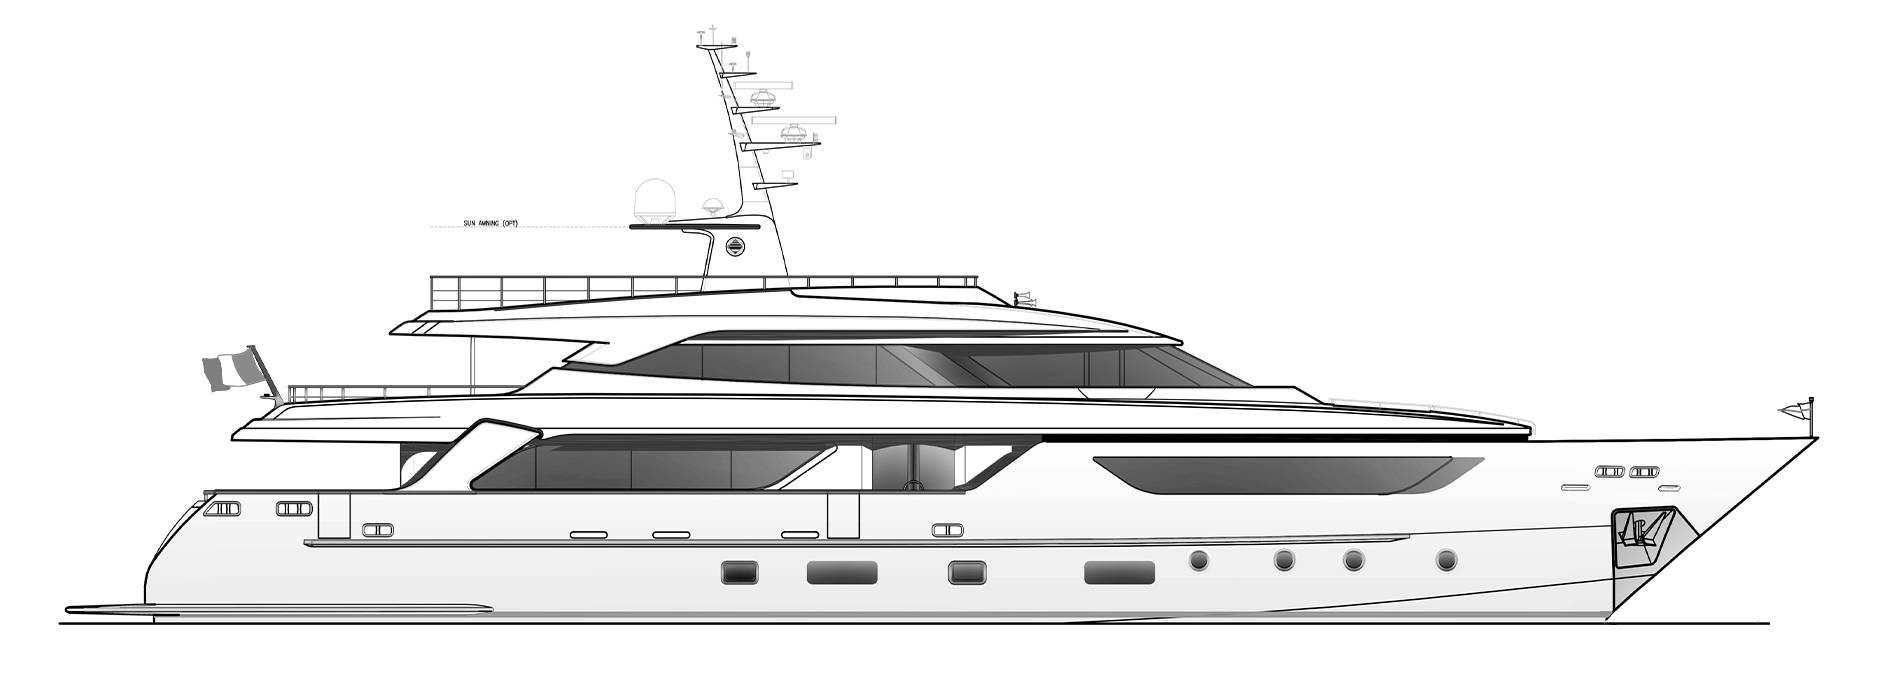 Sanlorenzo Yachts SD122-27 under offer Profile